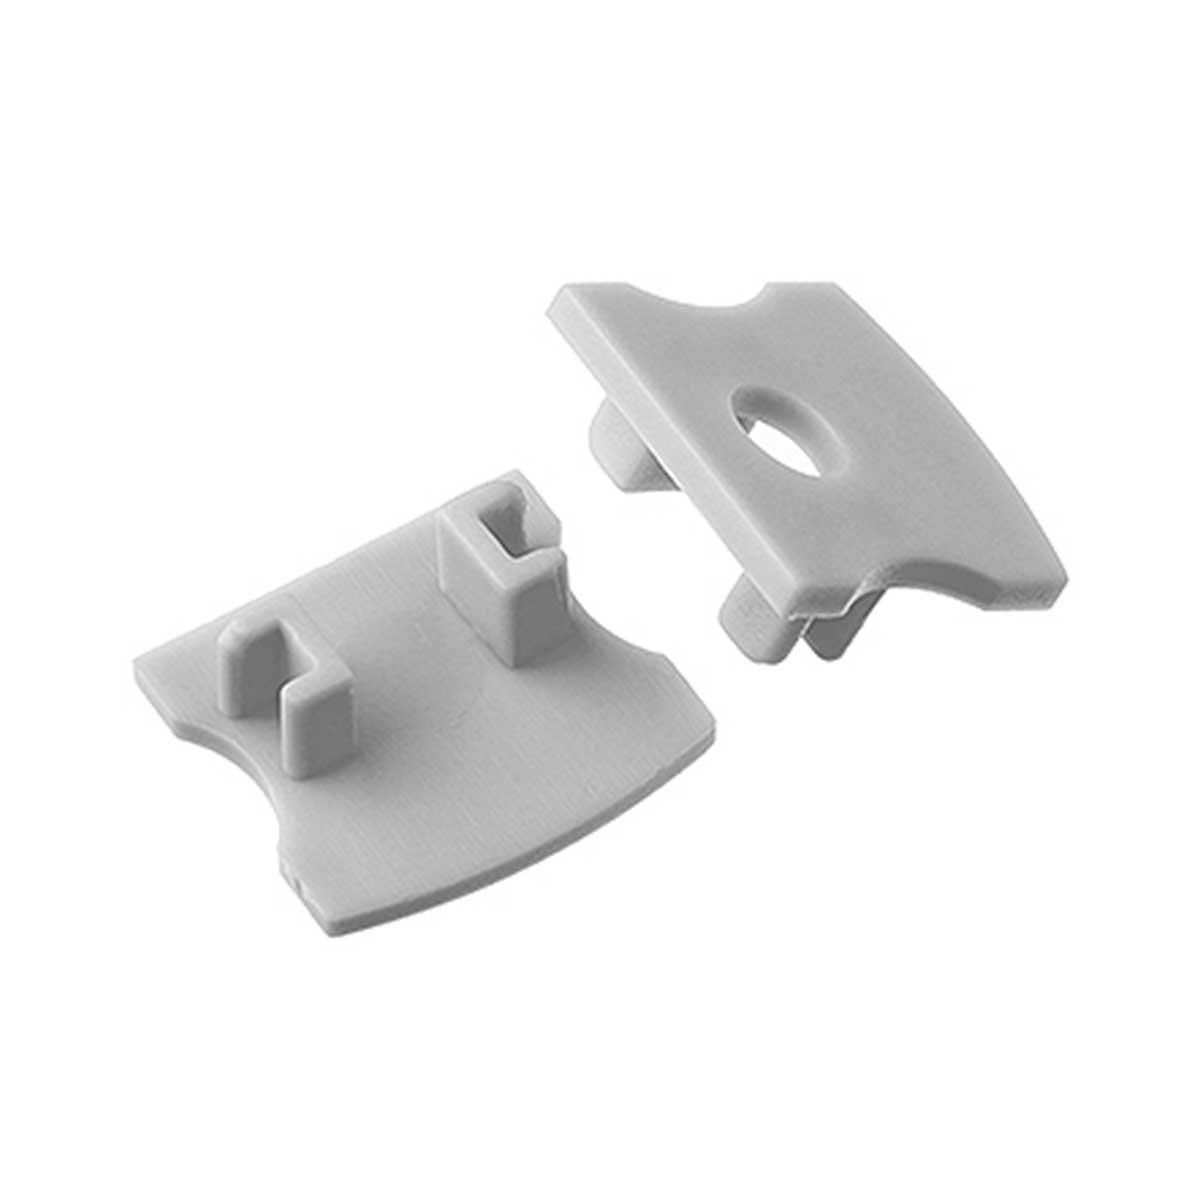 1 Paar Endkappen für Aufbau U-Profil 17x14mm (4276)